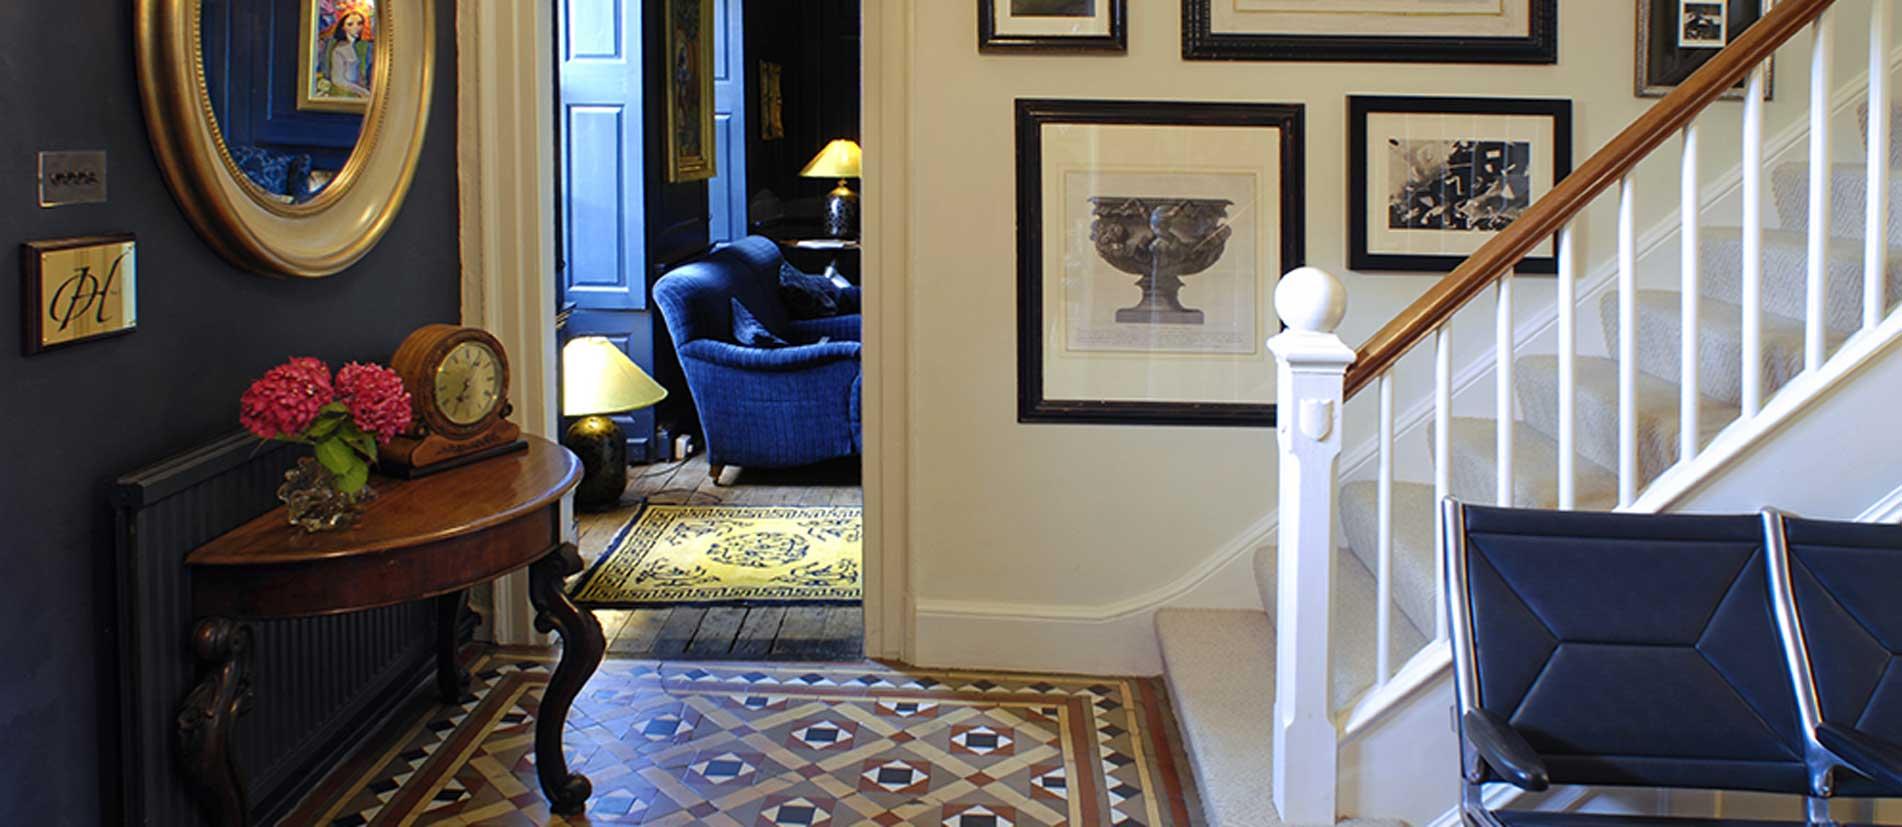 use-hall-hallway-cropped-copy.jpg